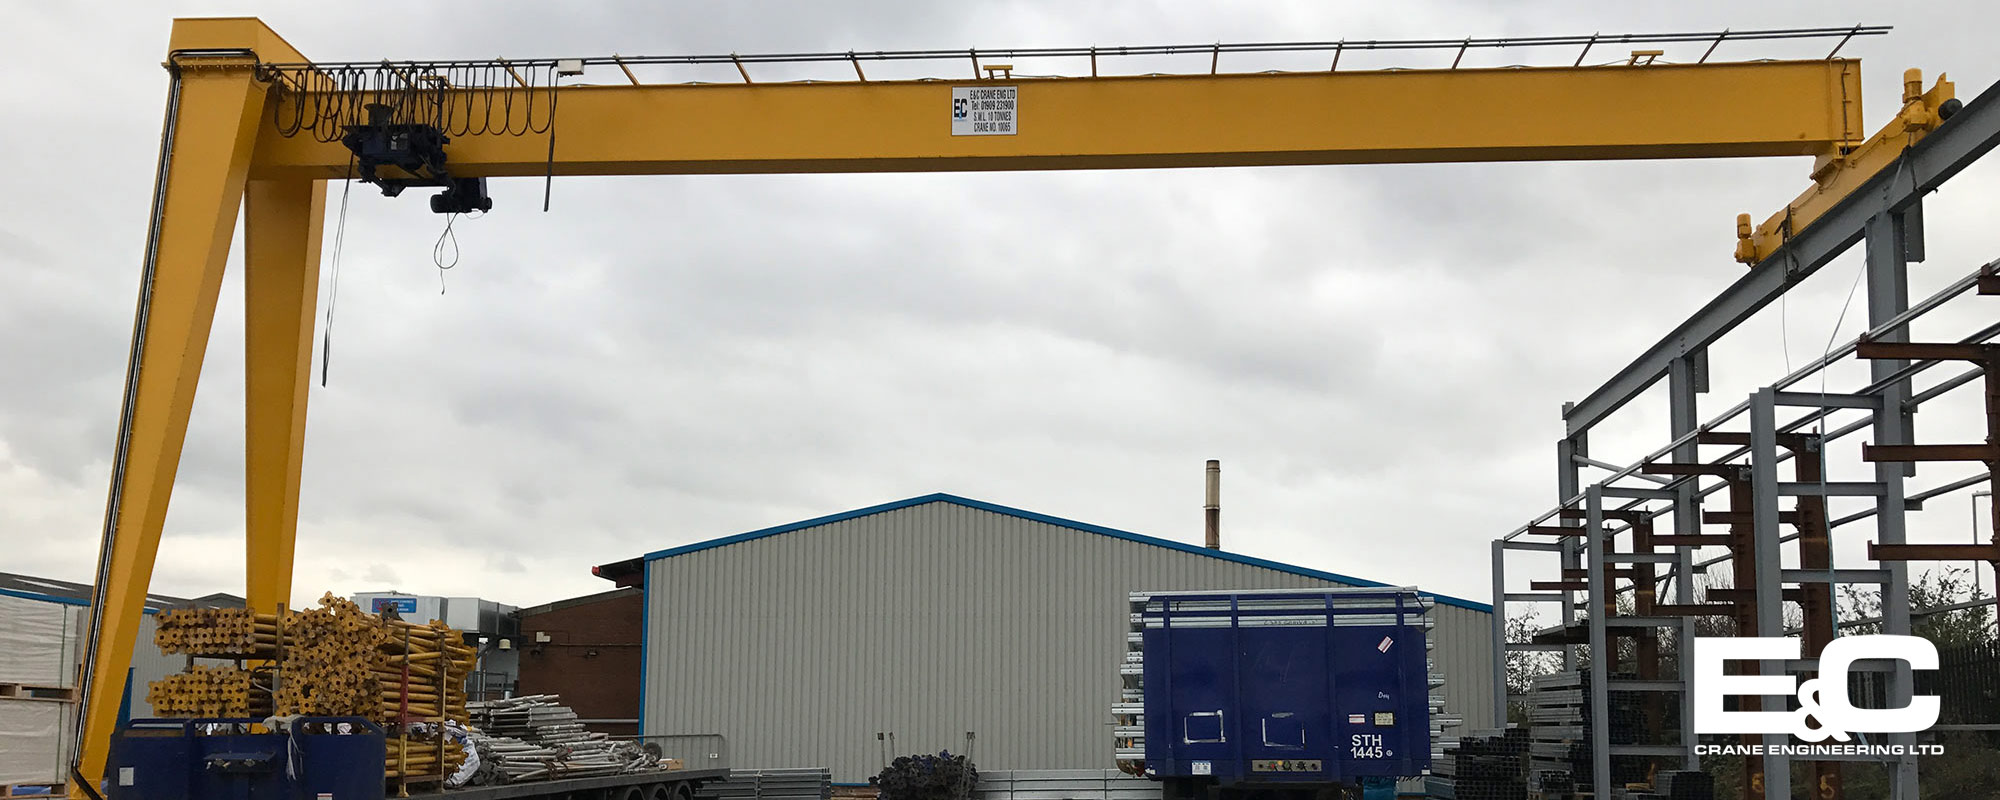 used-cranes-0